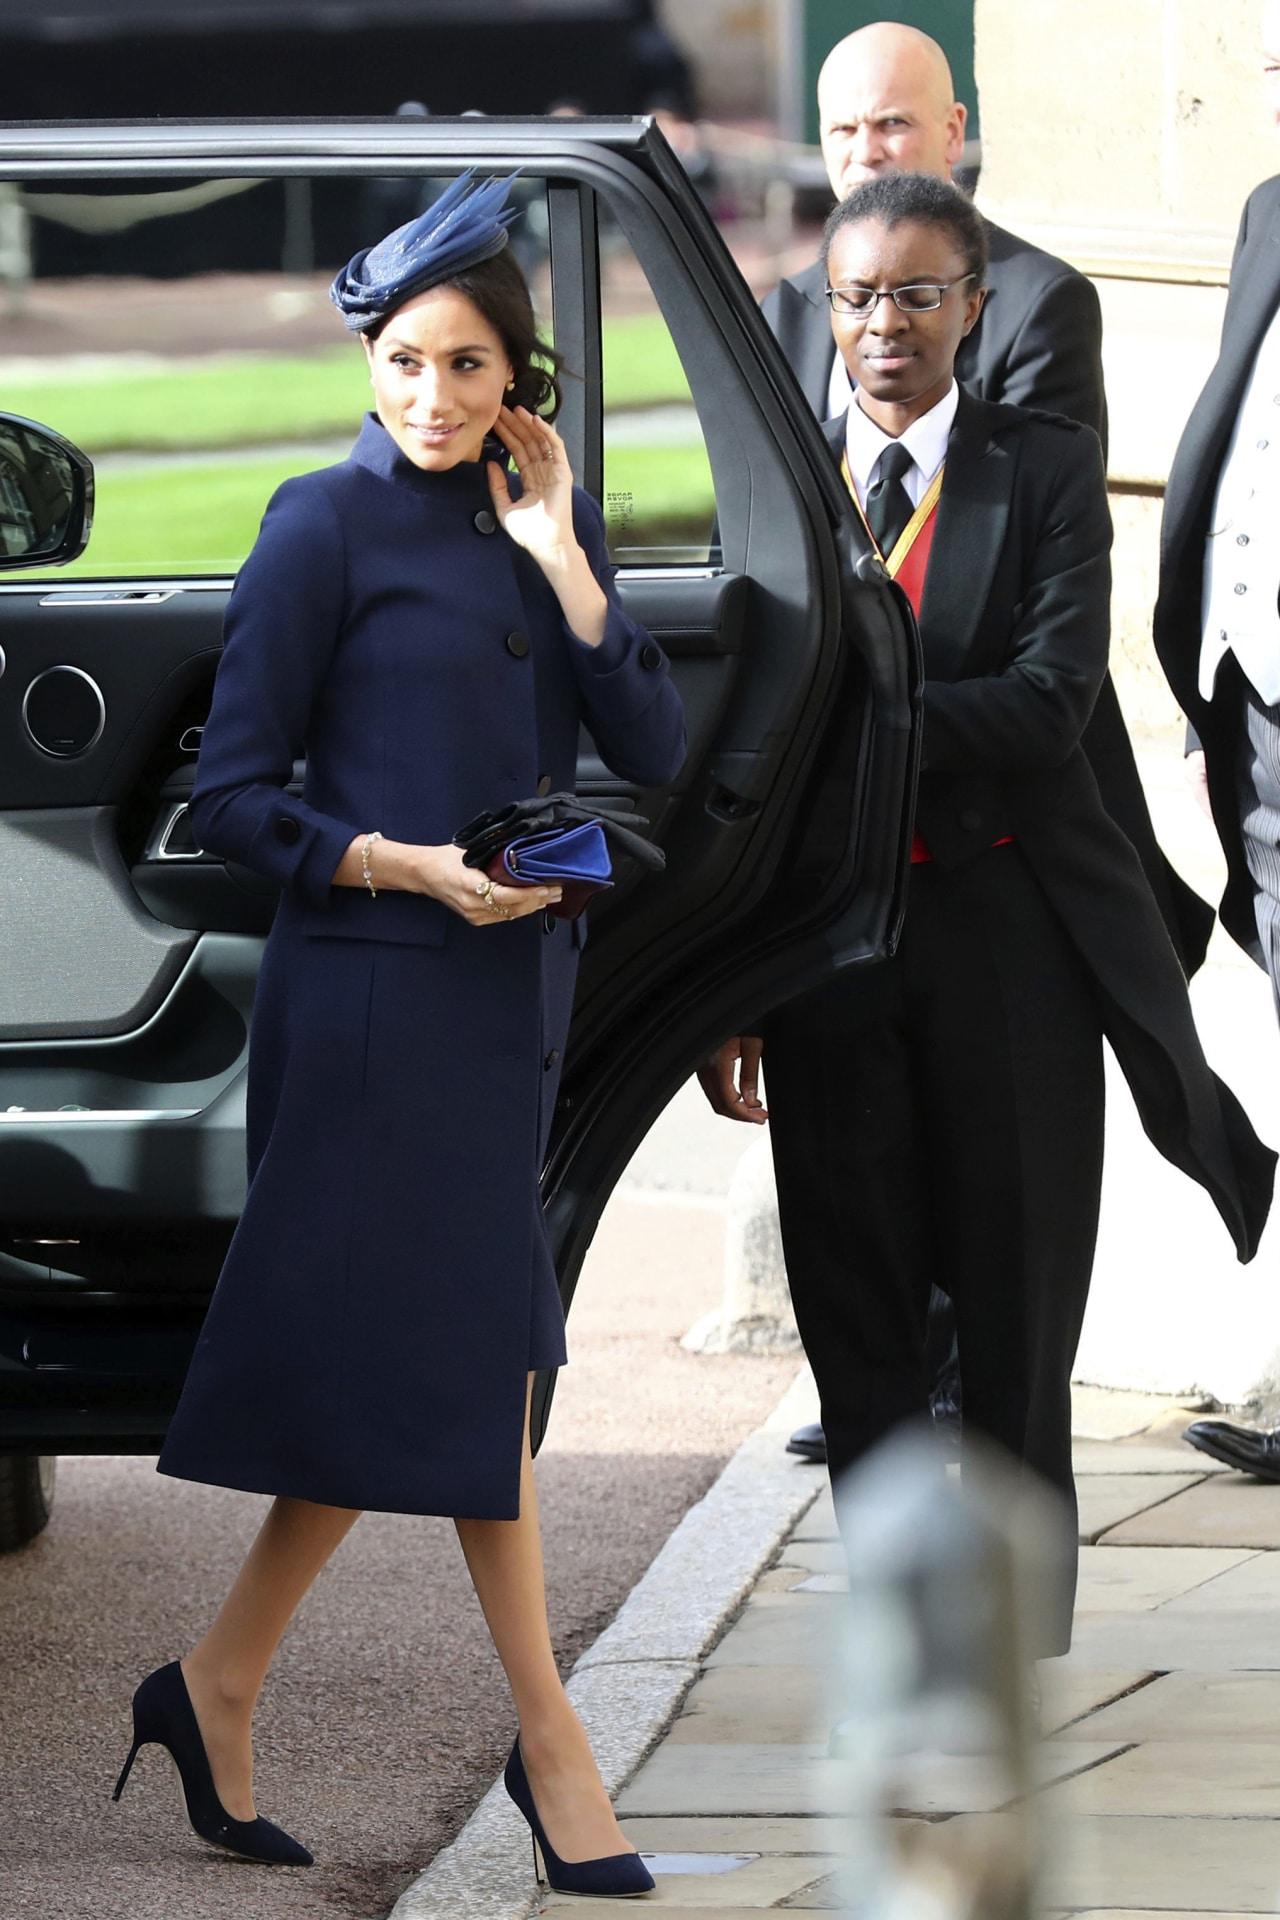 Meghan Markle wore her own wedding dress designer to Princess